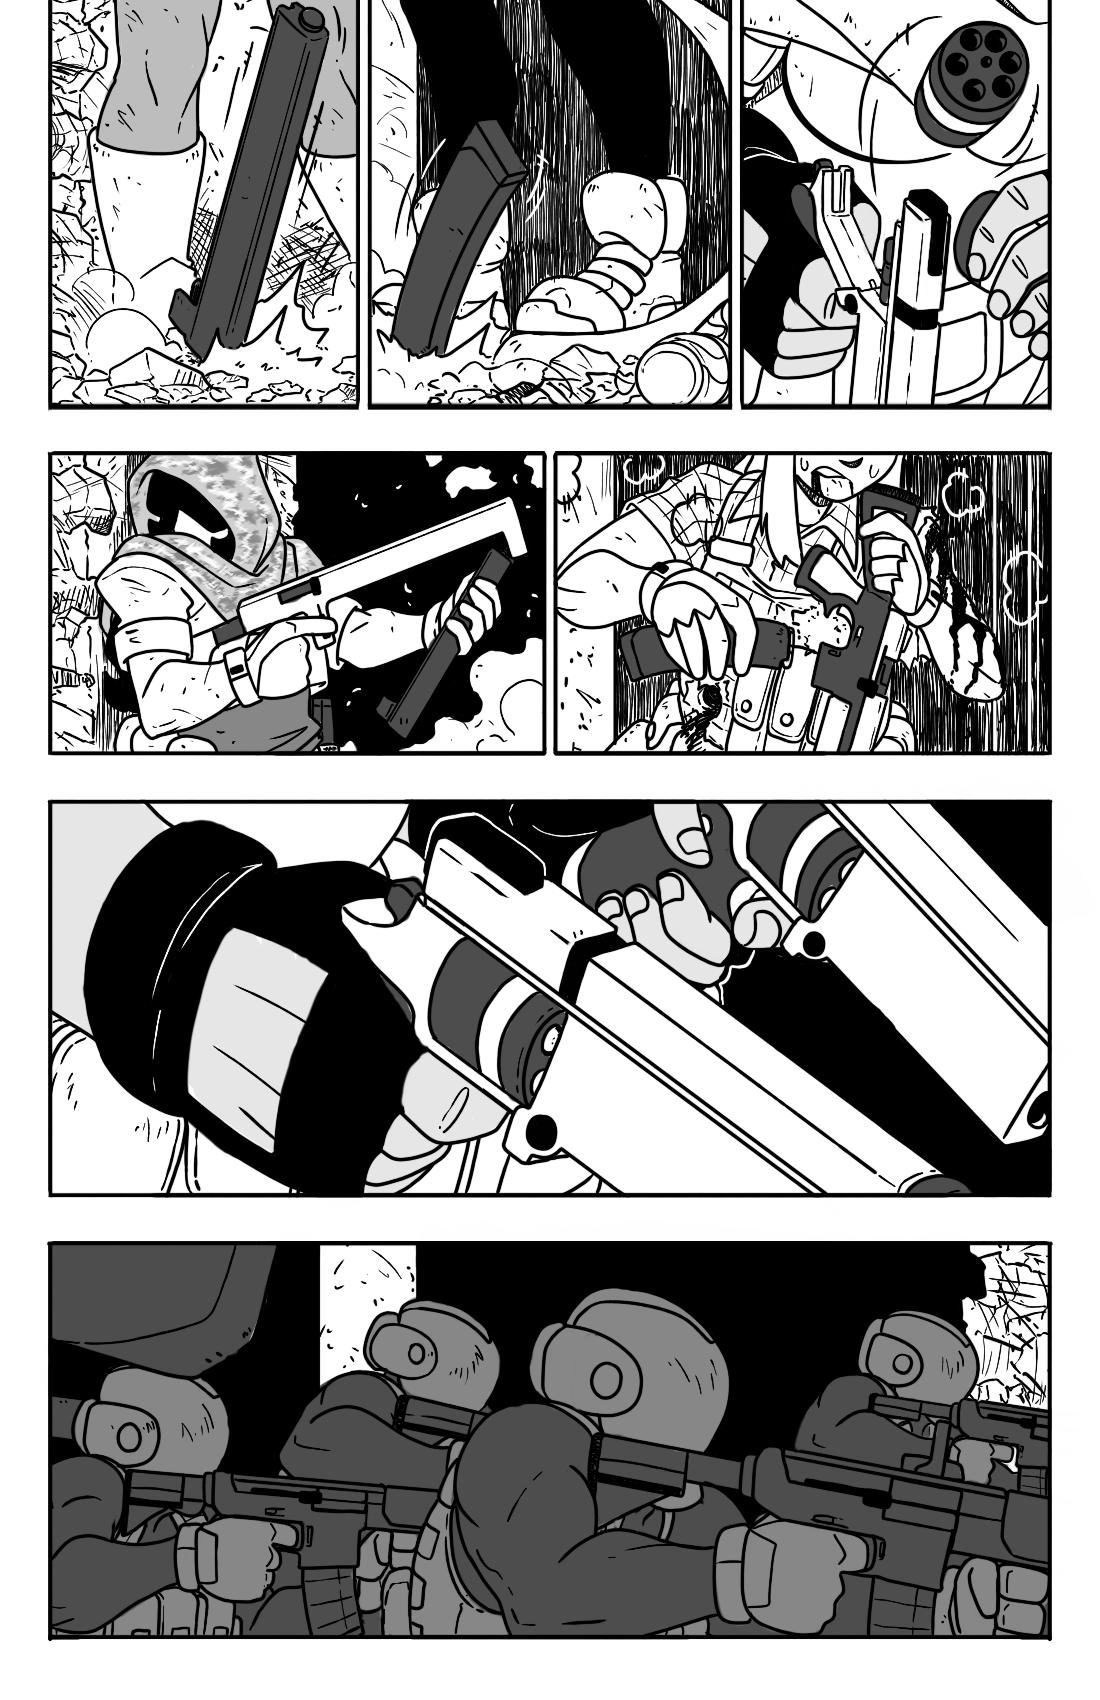 Pony Express Part 1 pg.33